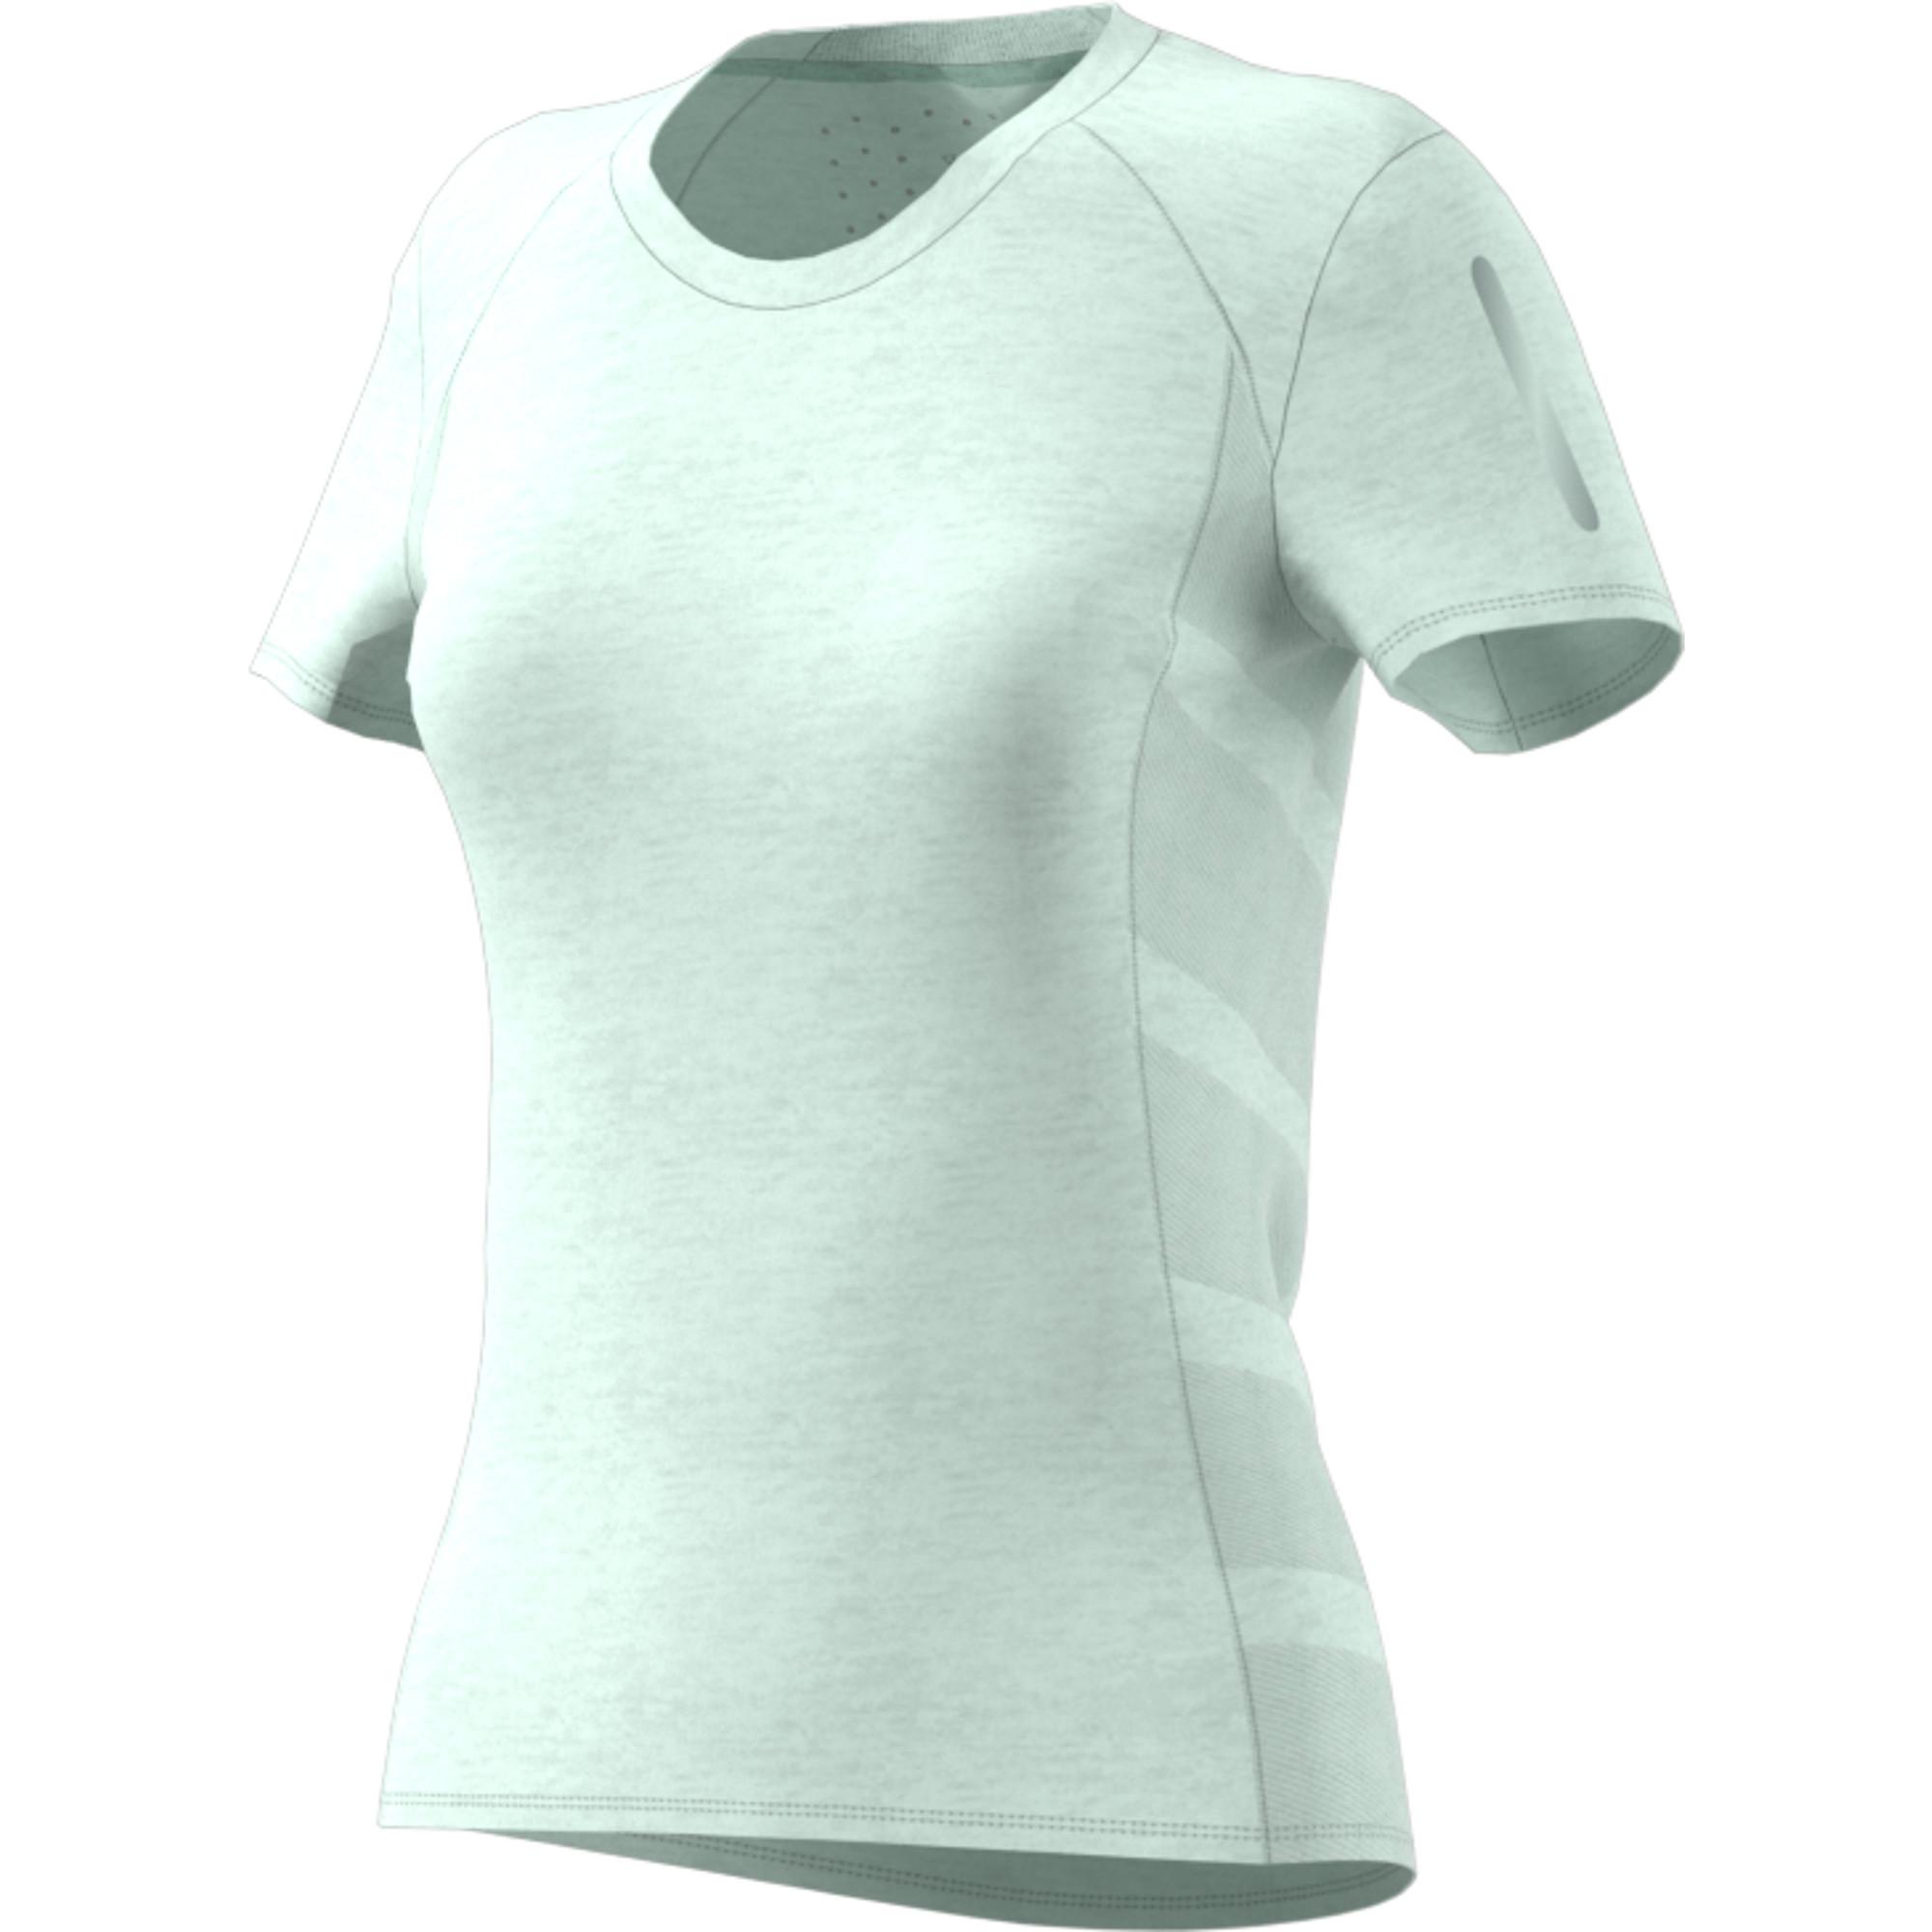 buy popular b40d0 7ccd2 adidas Supernova 37C Short Sleeve Tee - Maillot de course pour Femme -  Blanc  21RUN